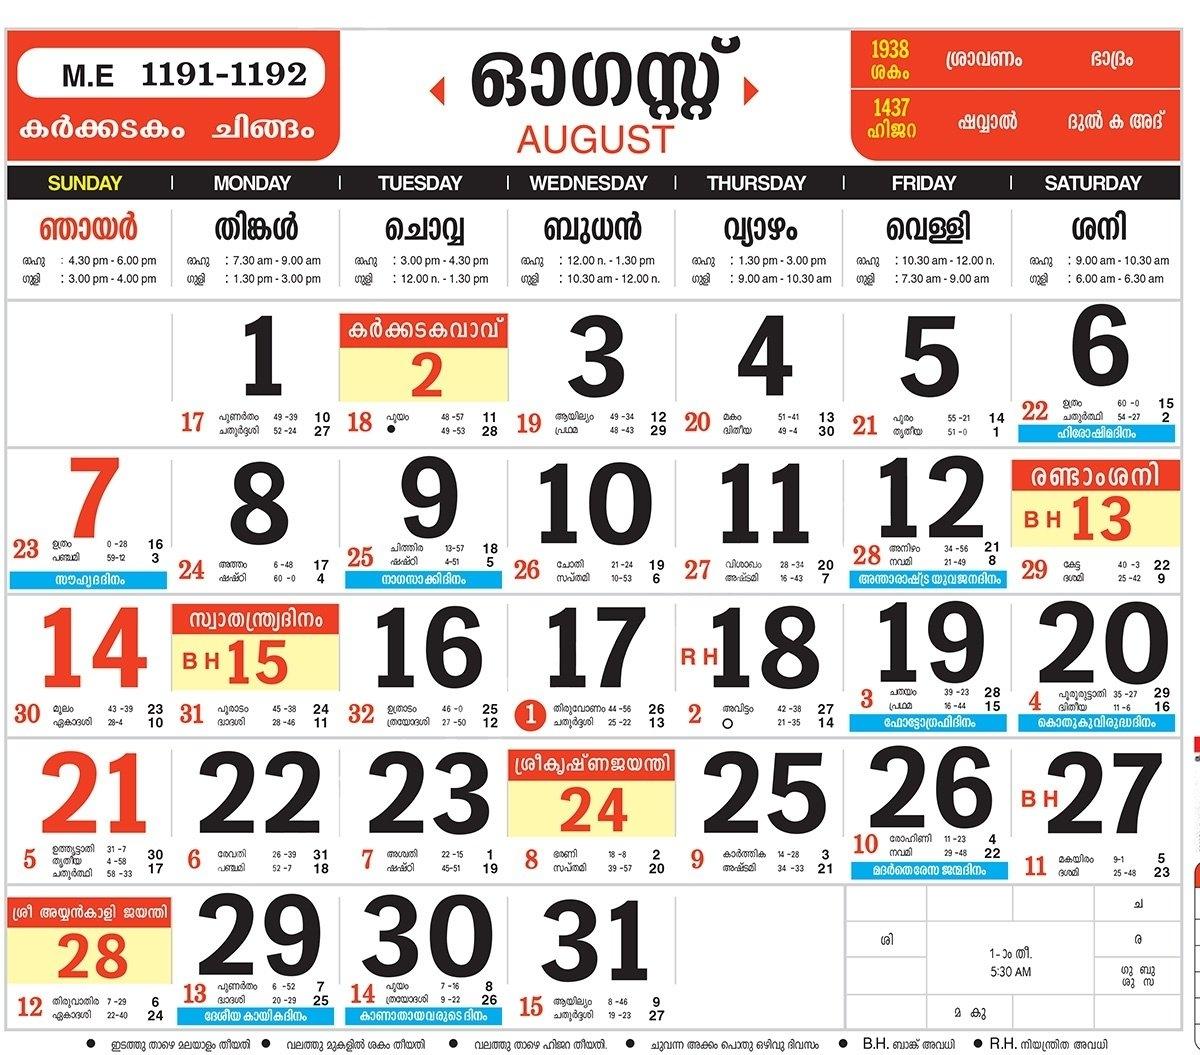 Islamic Calendar 2019 Saudi Arabia Awesome Elegant 30 Examples Manorama E Calendar 2019